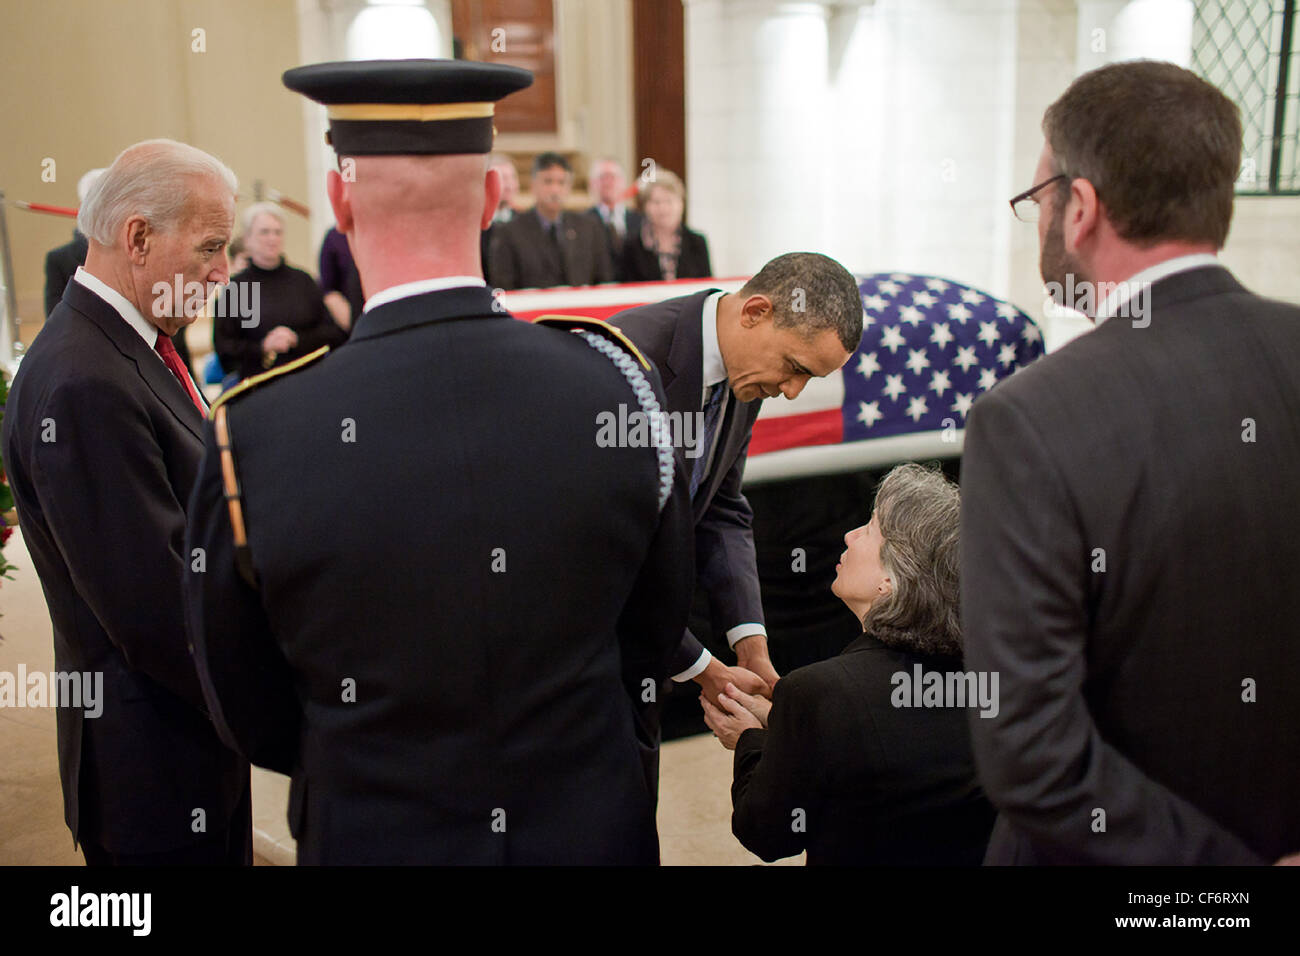 President Barack Obama and Vice President Joe Biden greet Susannah Flanagan, daughter of Frank Buckles at Arlington - Stock Image